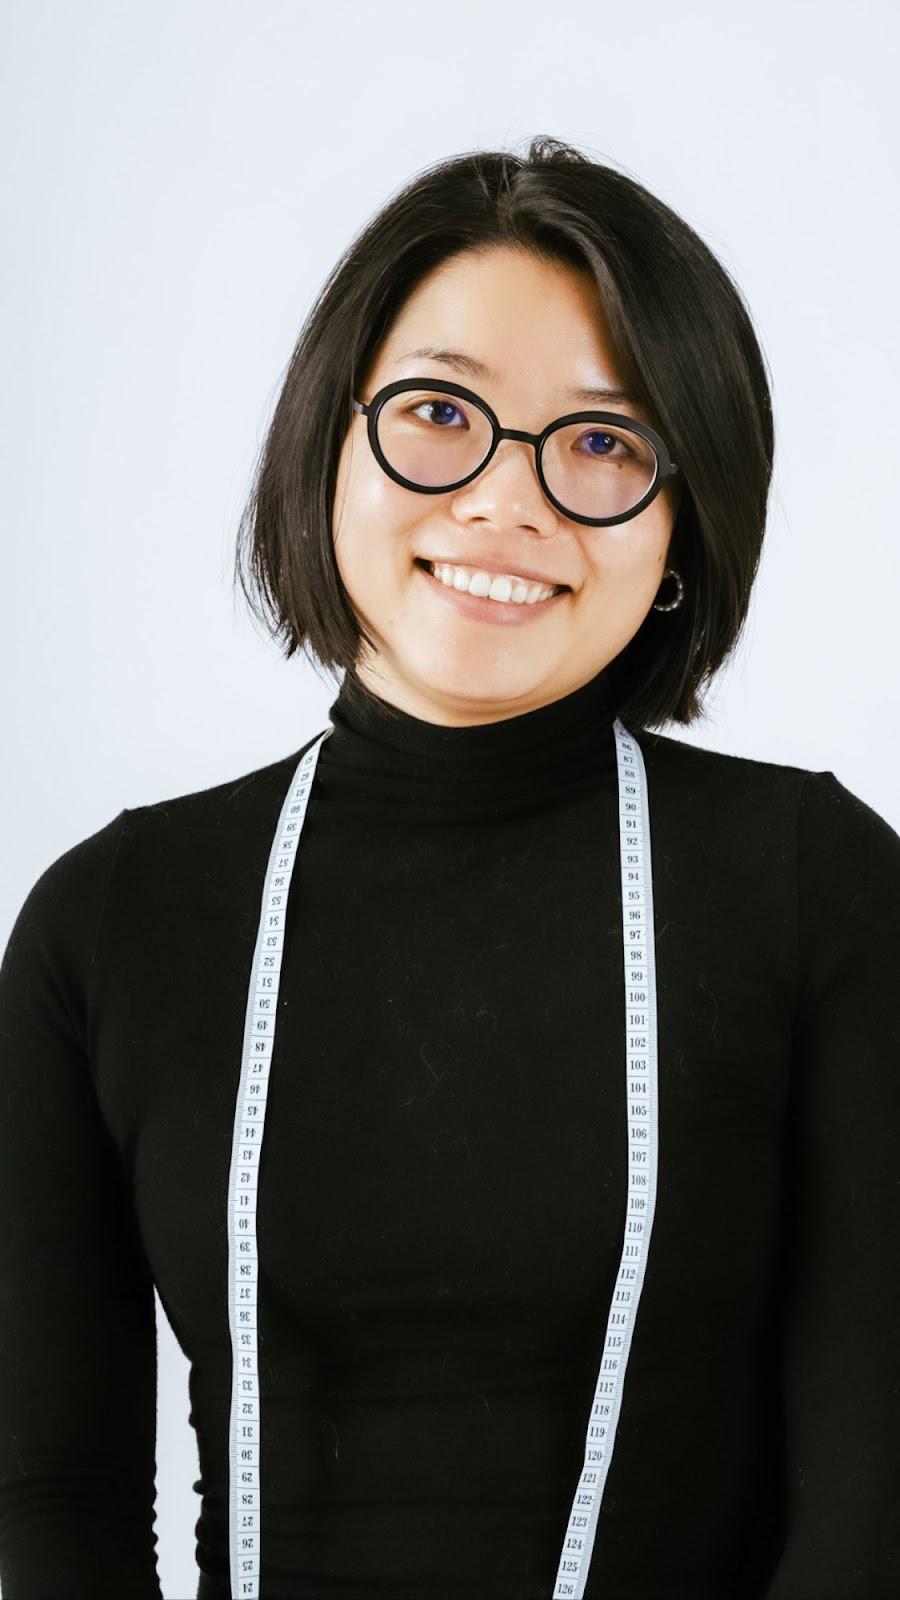 Xi Chen - founder and creative director of sonderlier headshot